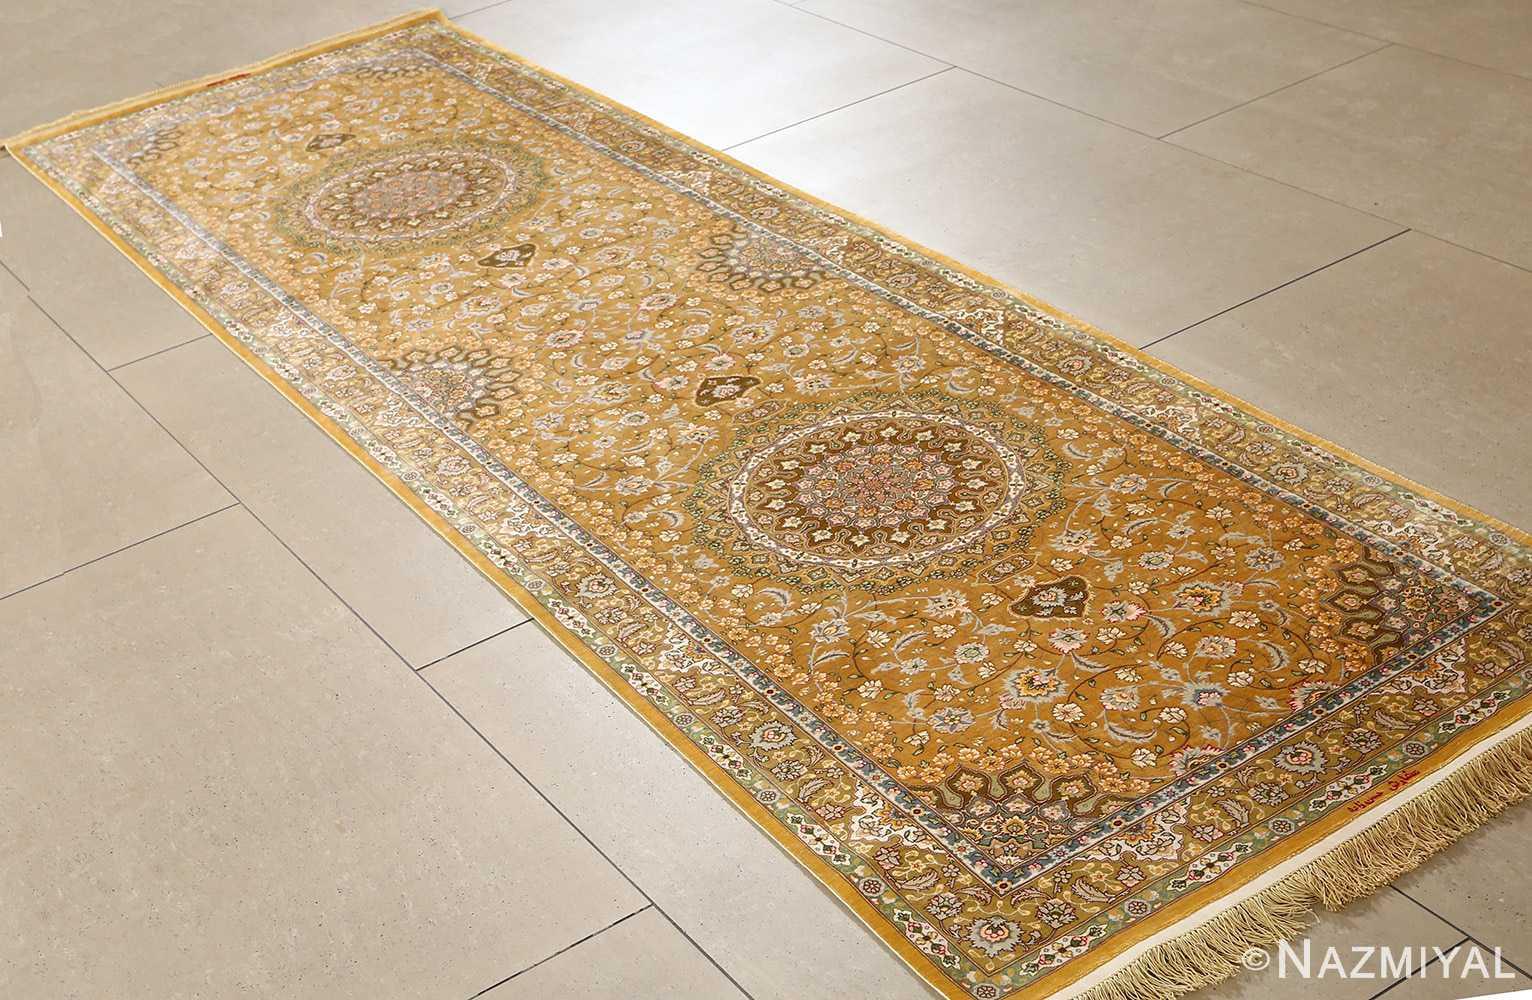 fine shahsavarpour design vintage tabriz persian rug 51044 side Nazmiyal